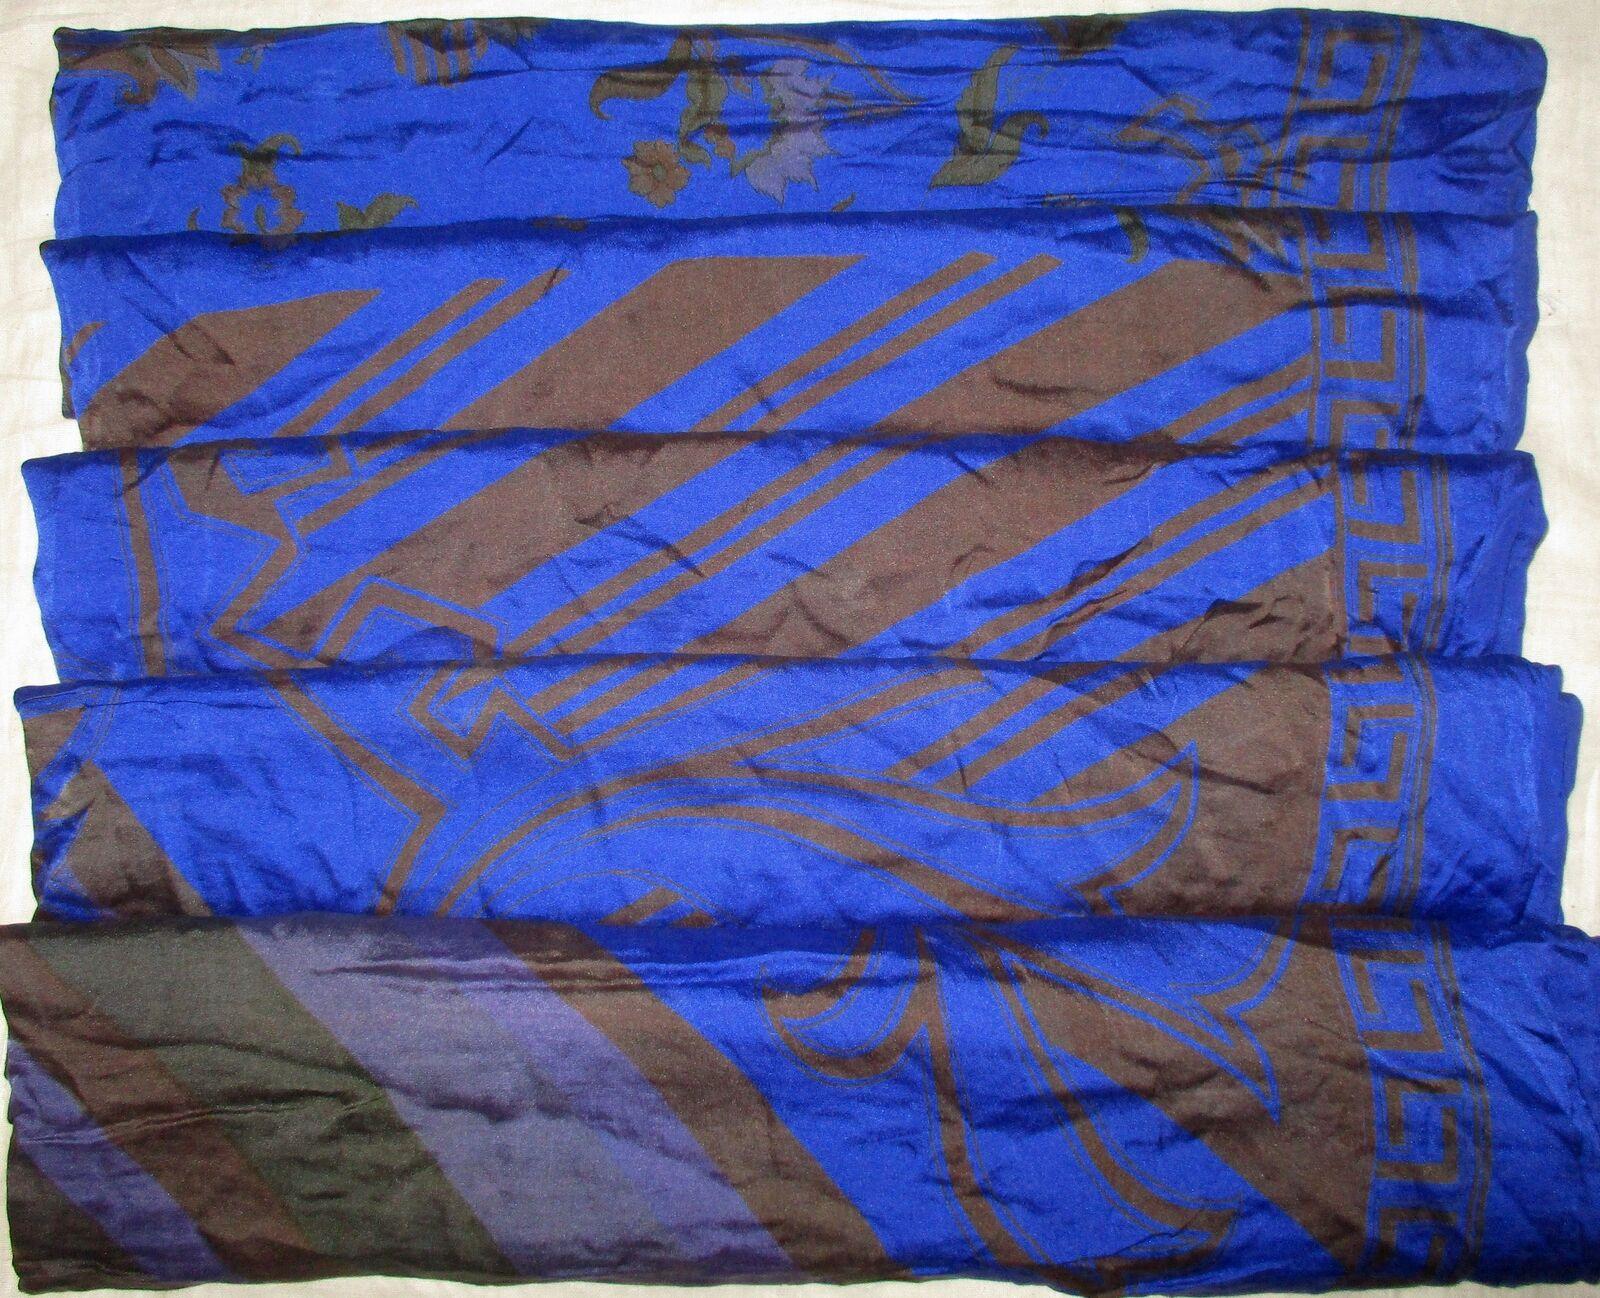 WEARABLE SILK BLEND ANTIQUE VINTAGE SARI SAREE 5 YD Ga29 Blue Black #ABHZI